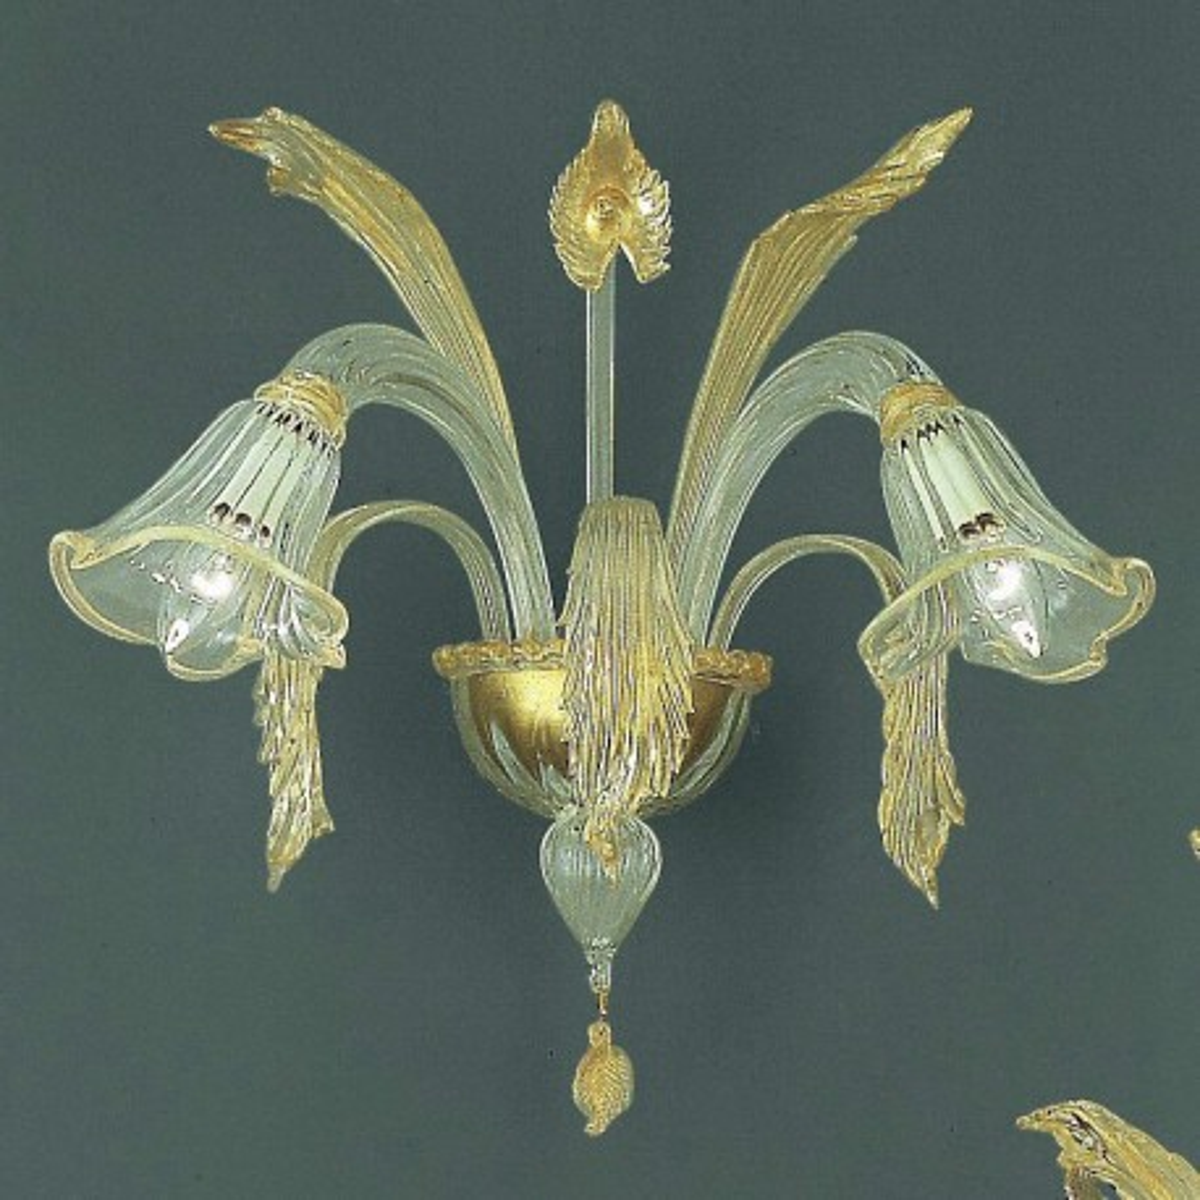 Laguna 2 flammig Murano wandleuchte - transparent Gold Farbe